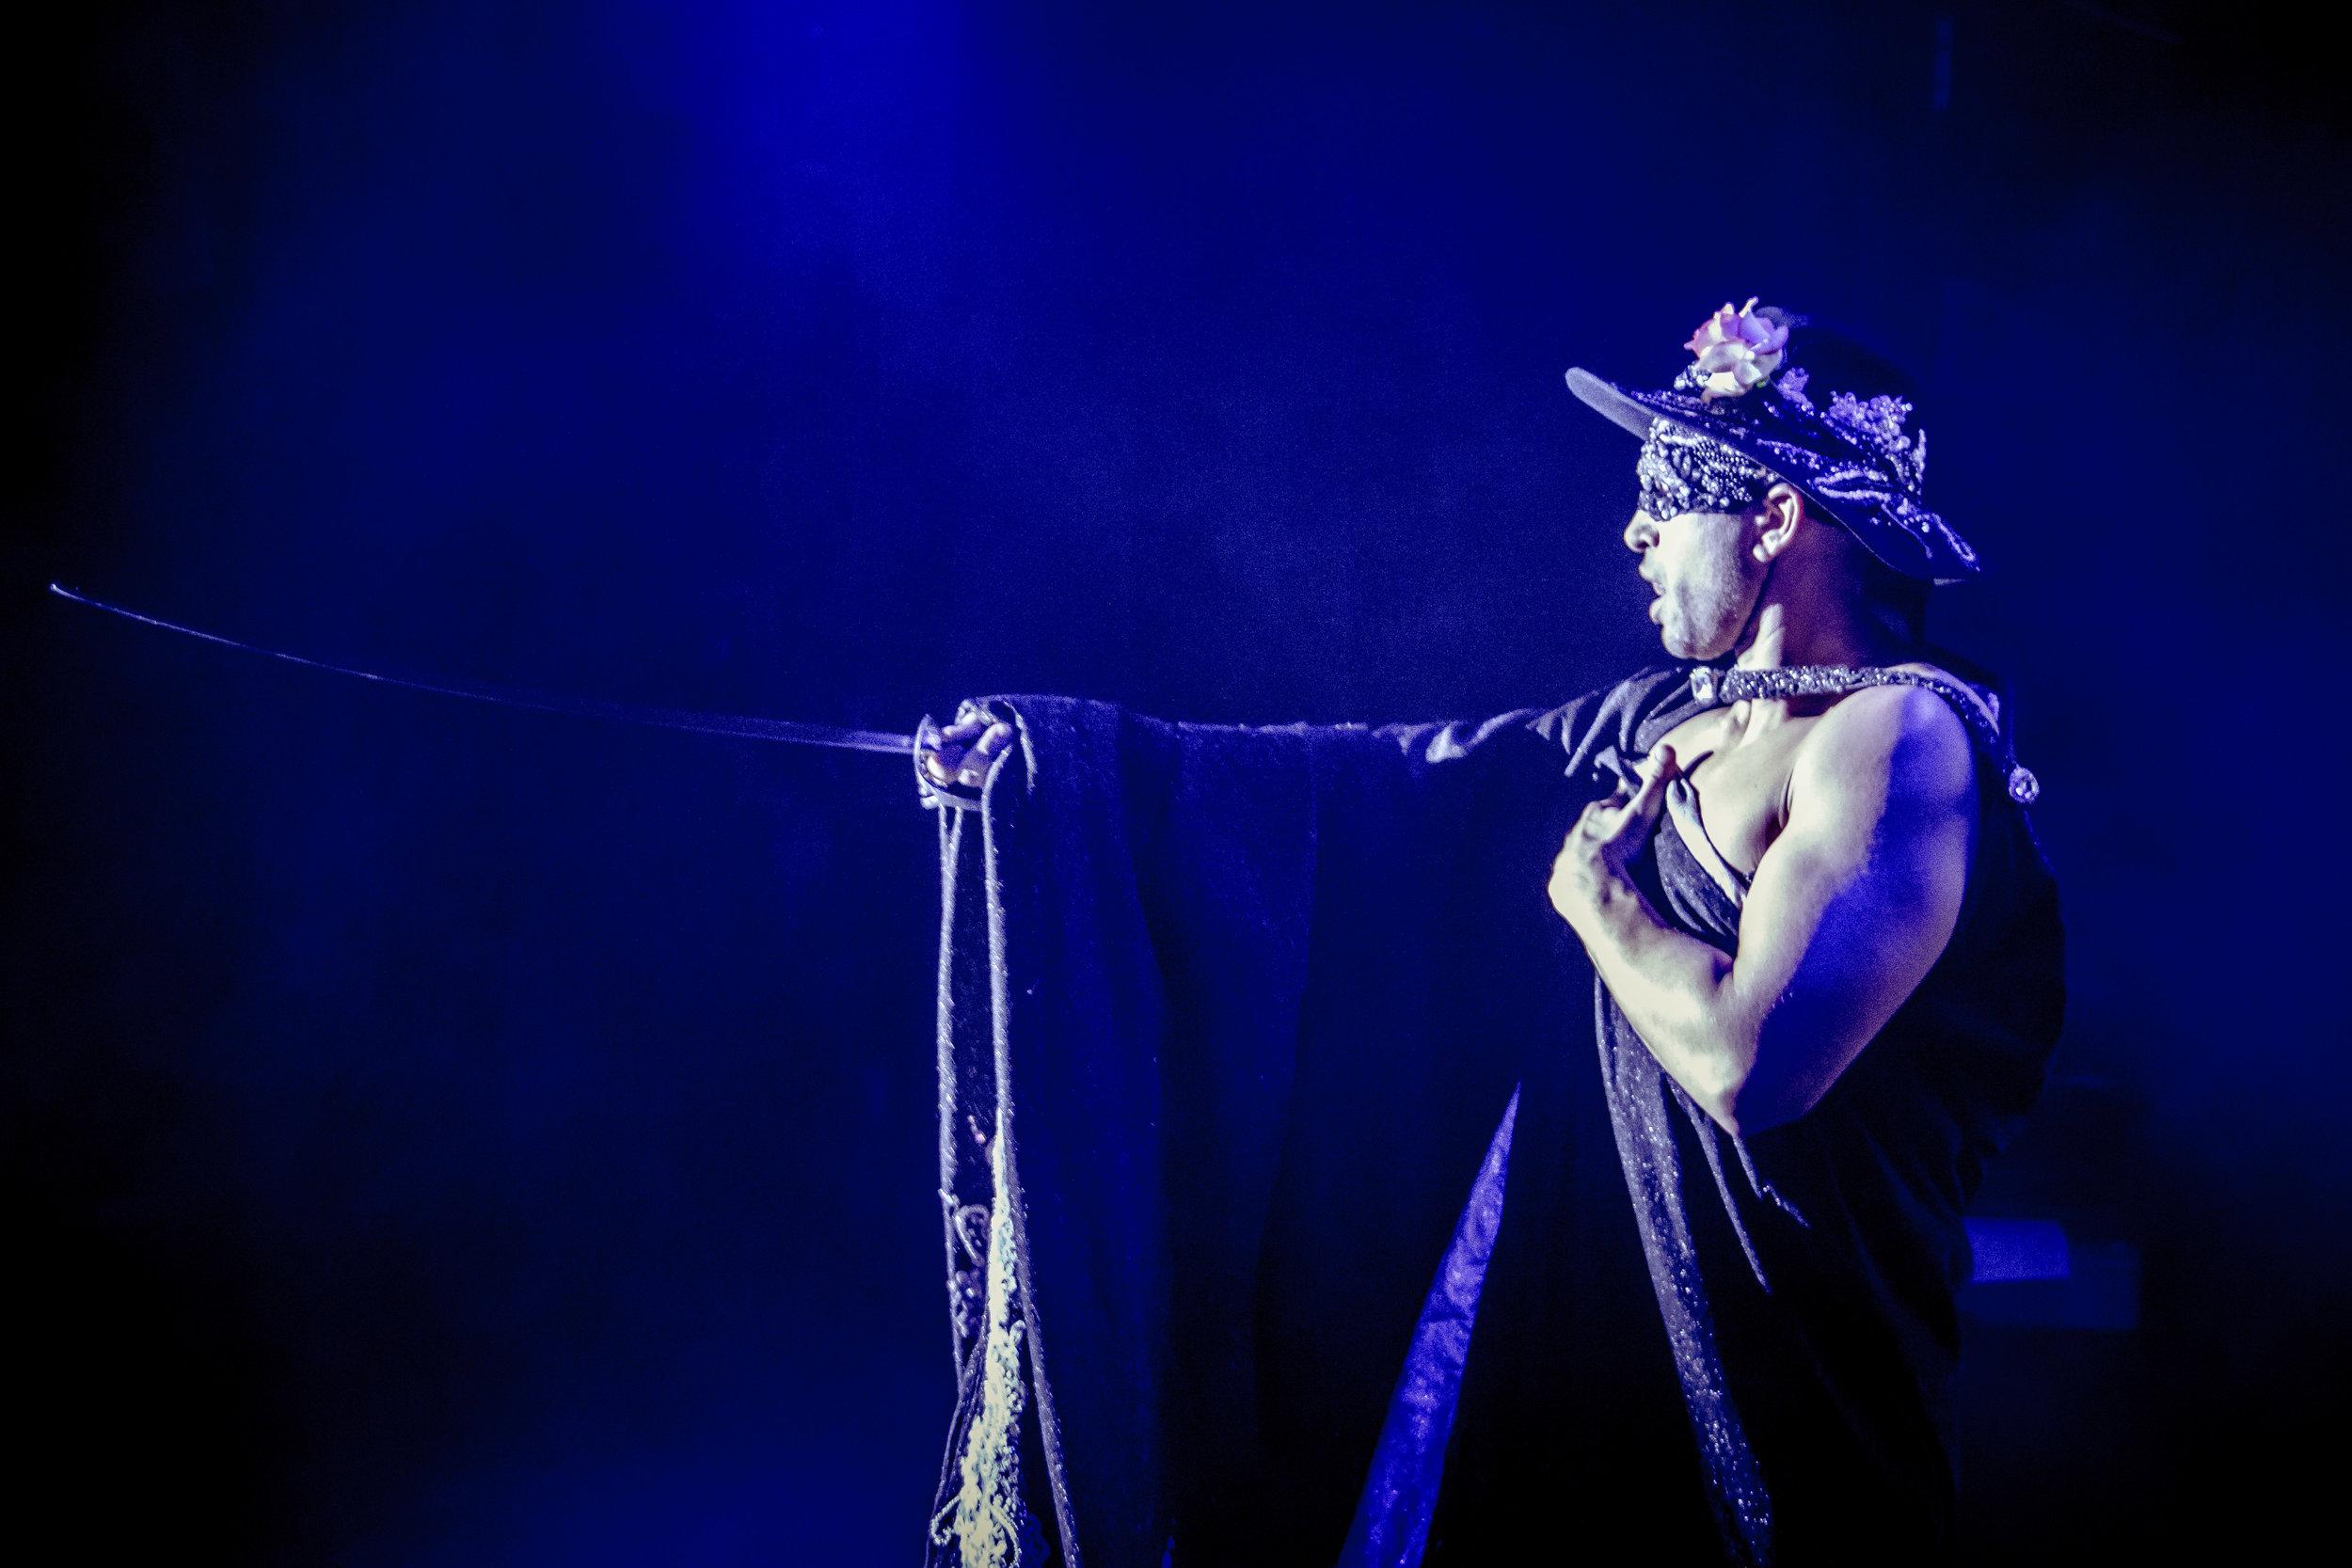 Swiss Burlesque Festival 2018 by Dirk Behlau-3409.jpg